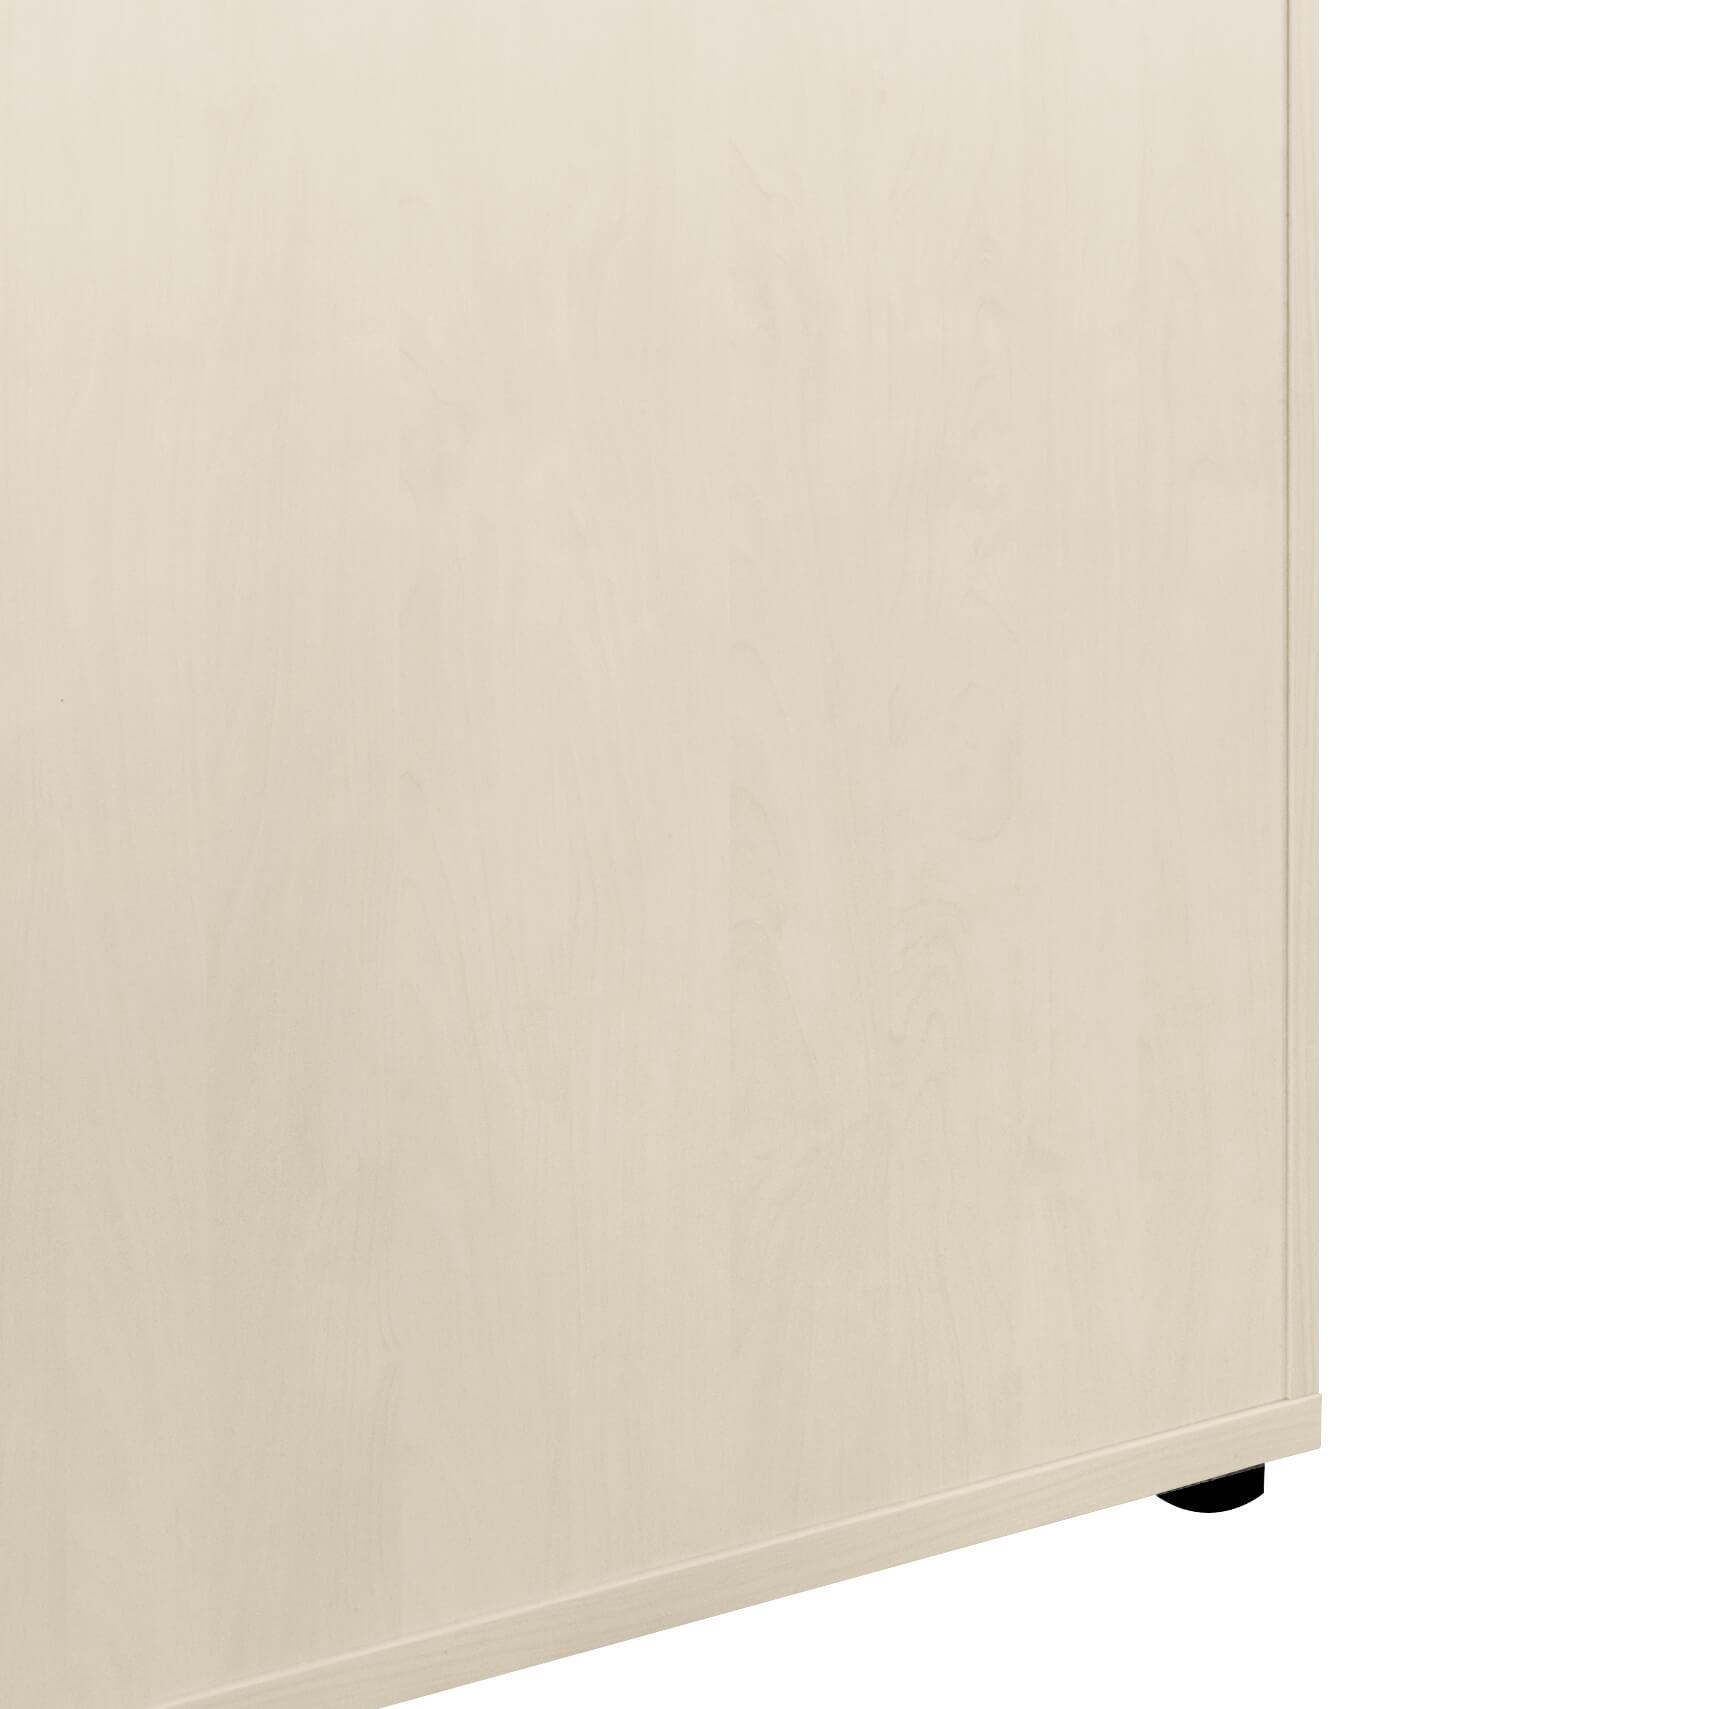 PROFI Vitrinenschrank mit Hängeregister abschließbar 5 OH Ahorn-Weiß Schrank Büroschrank